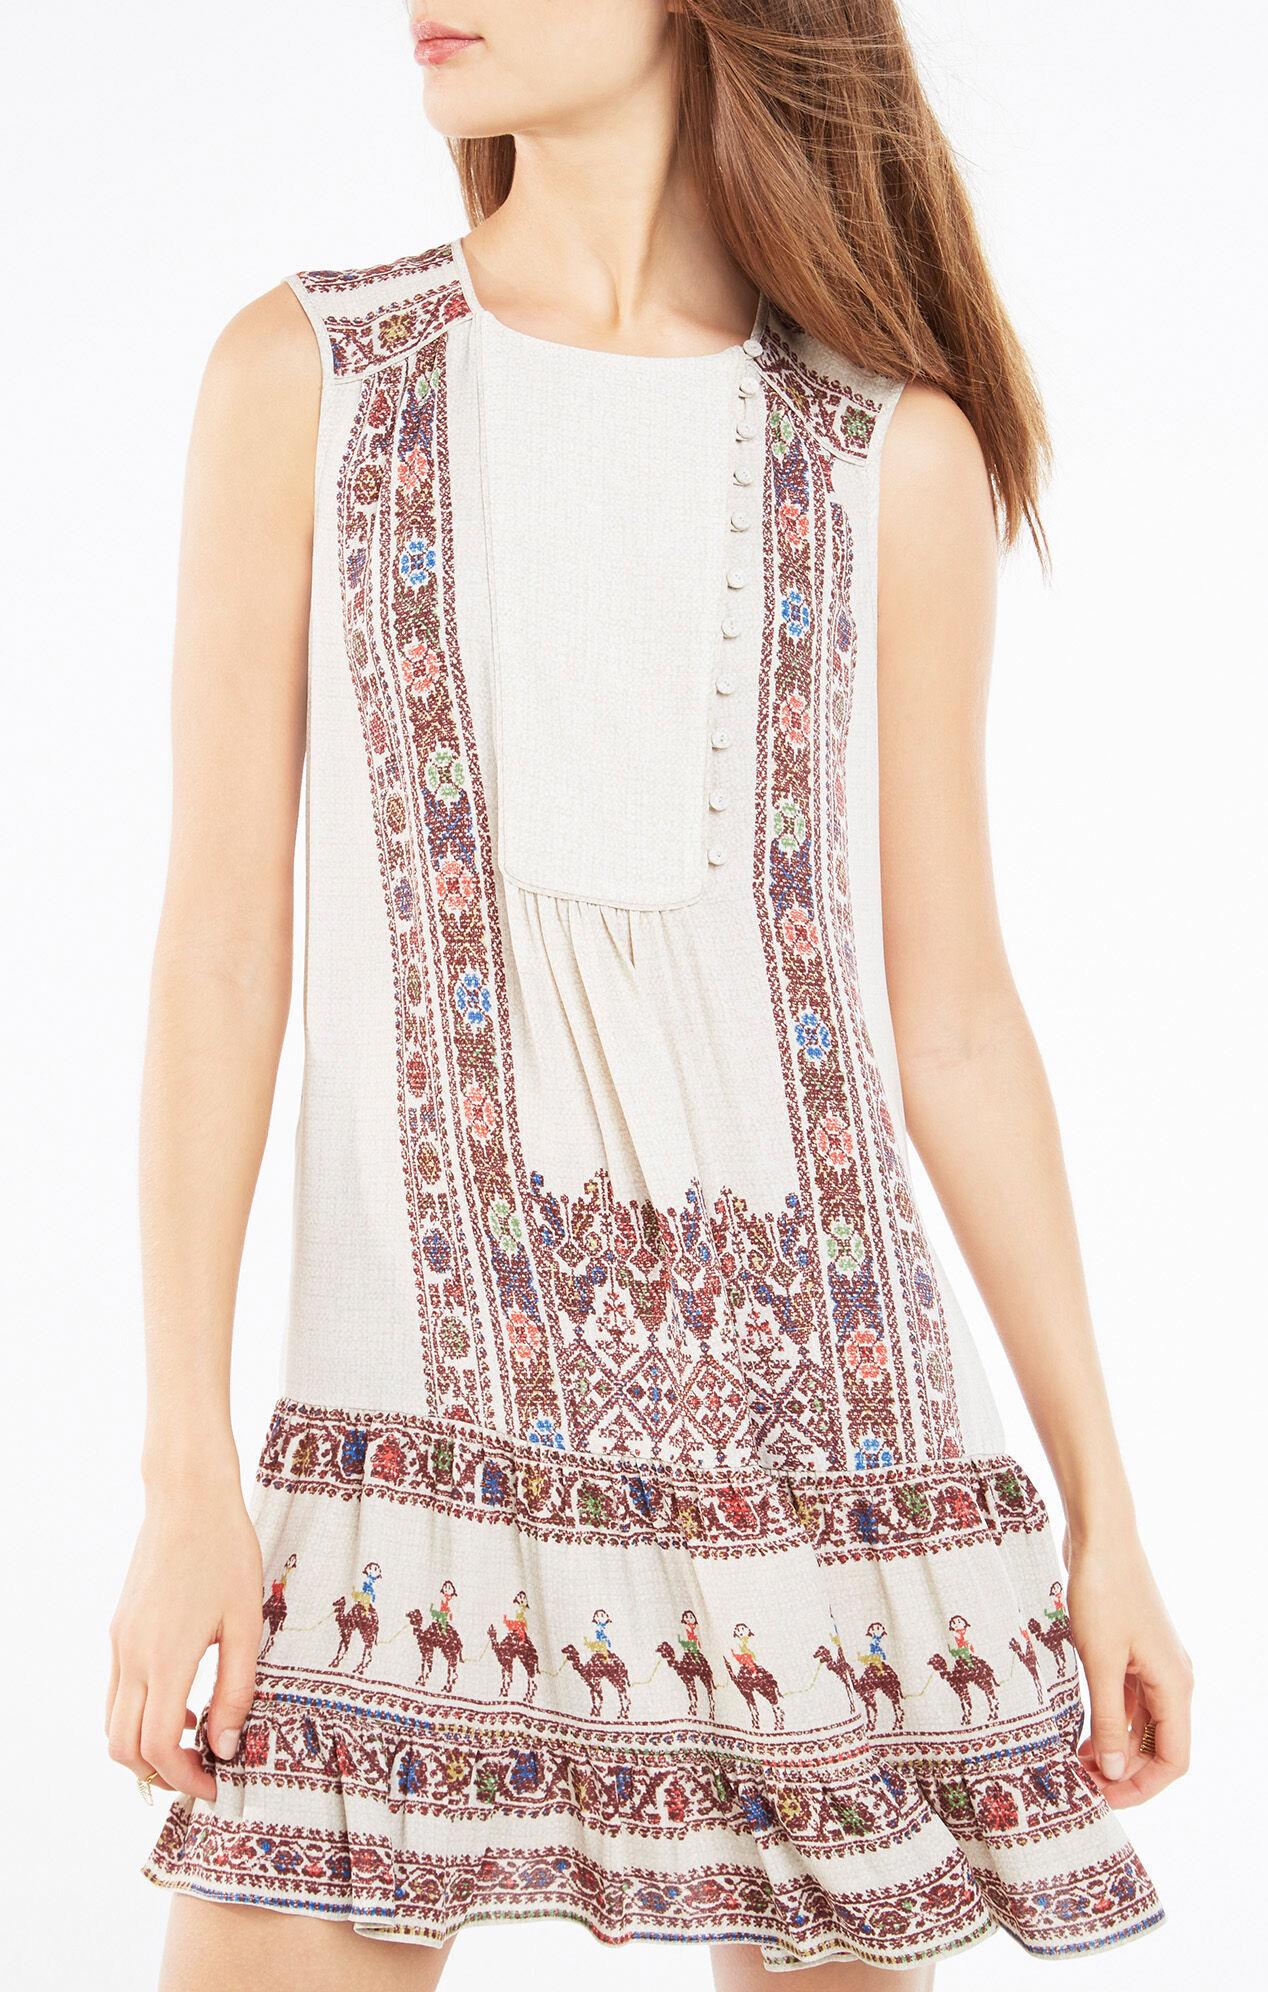 Yulissa Tapestry Print Flounce Dress